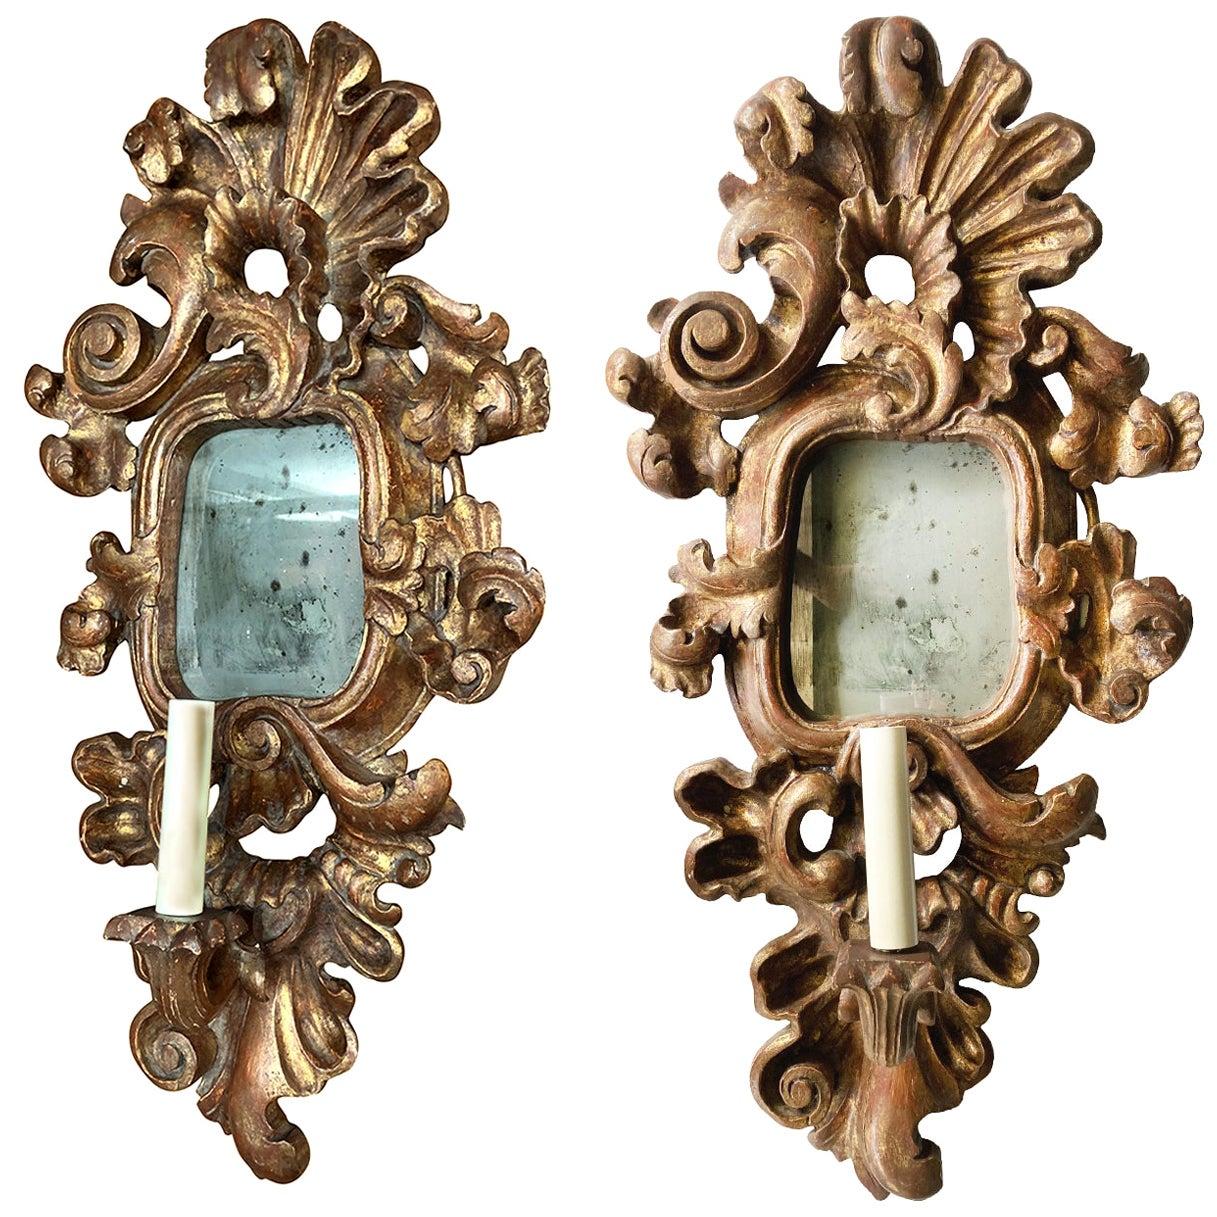 Pair of Antique Giltwood Mirror Sconces